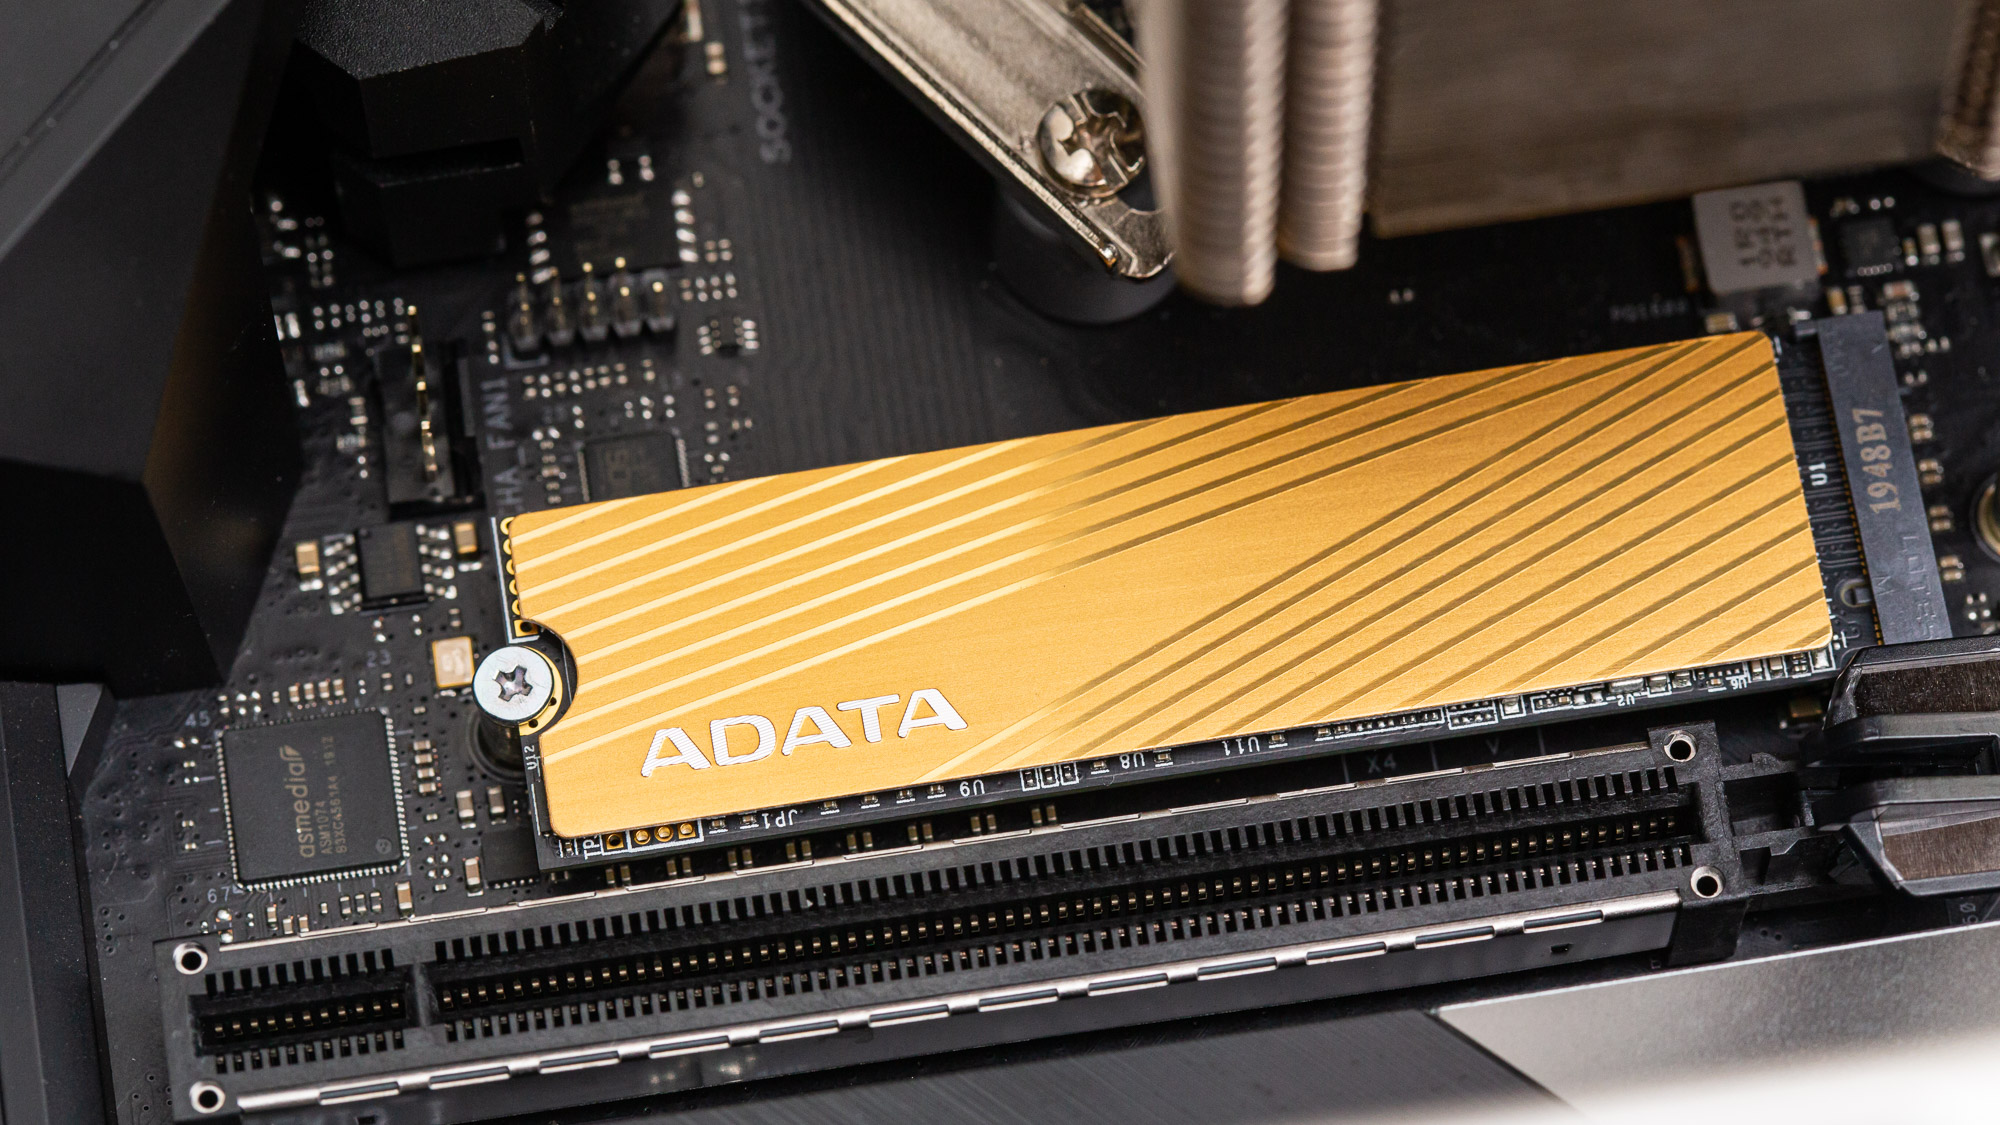 Adata Falcon M.2 NVMe SSD Review: Soaring above SATA   Tom's Hardware